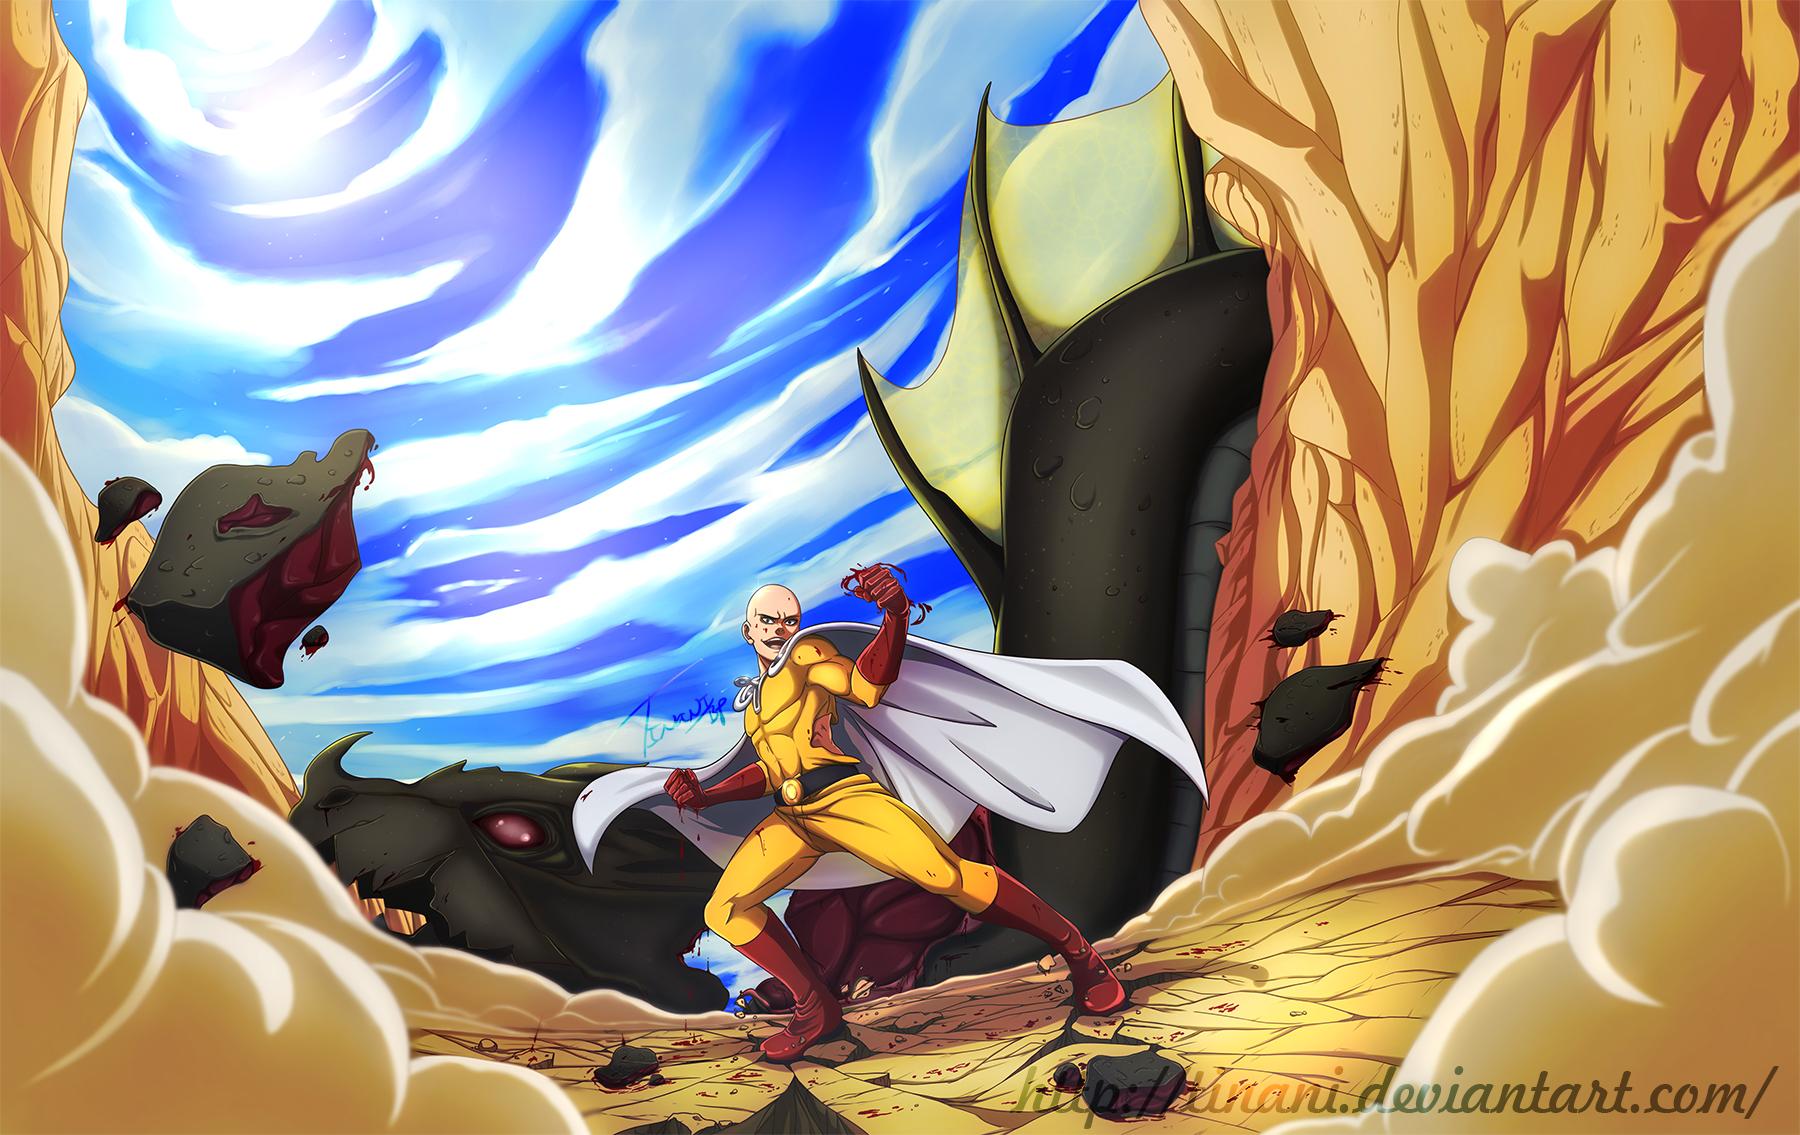 One Punch Man - Saitama by Tinani on DeviantArt